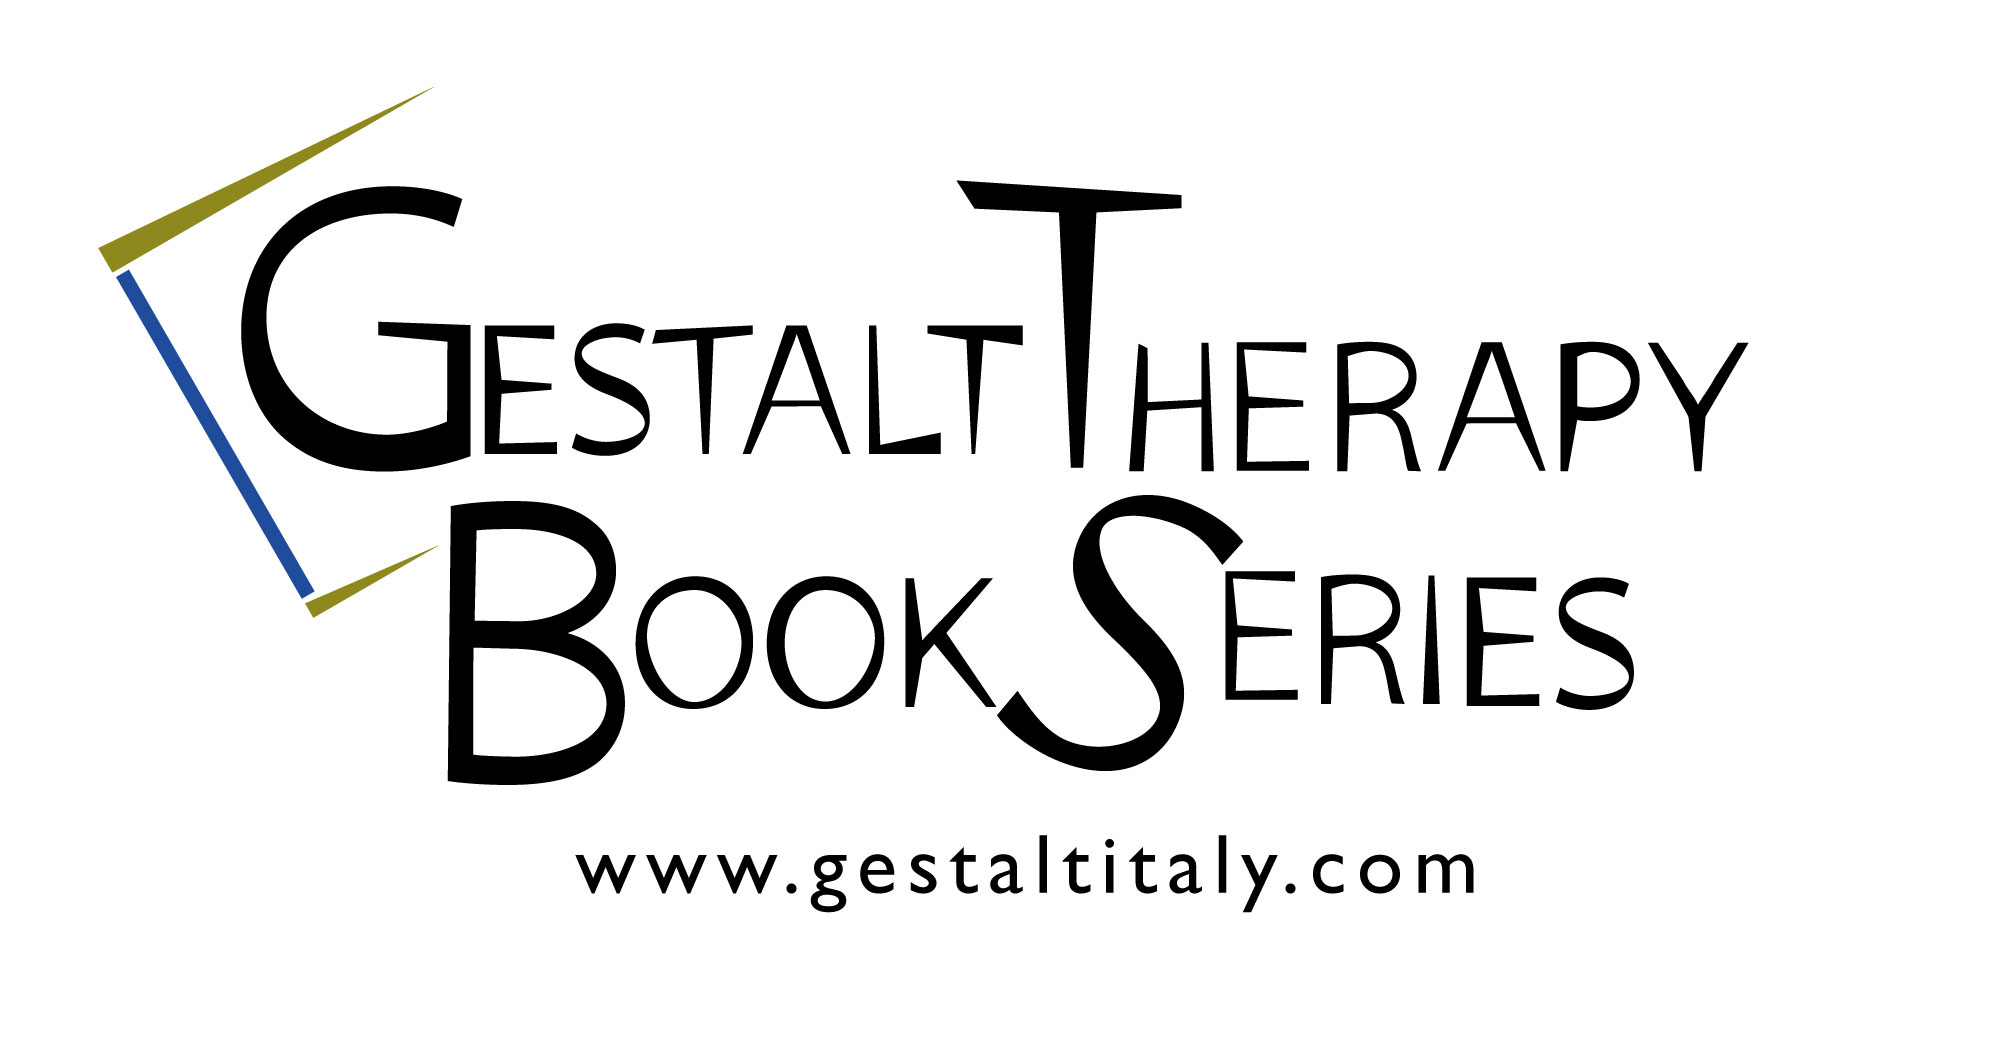 Istituto di Gestalt HCC Italy Therapy Psicoterapia Gestalt